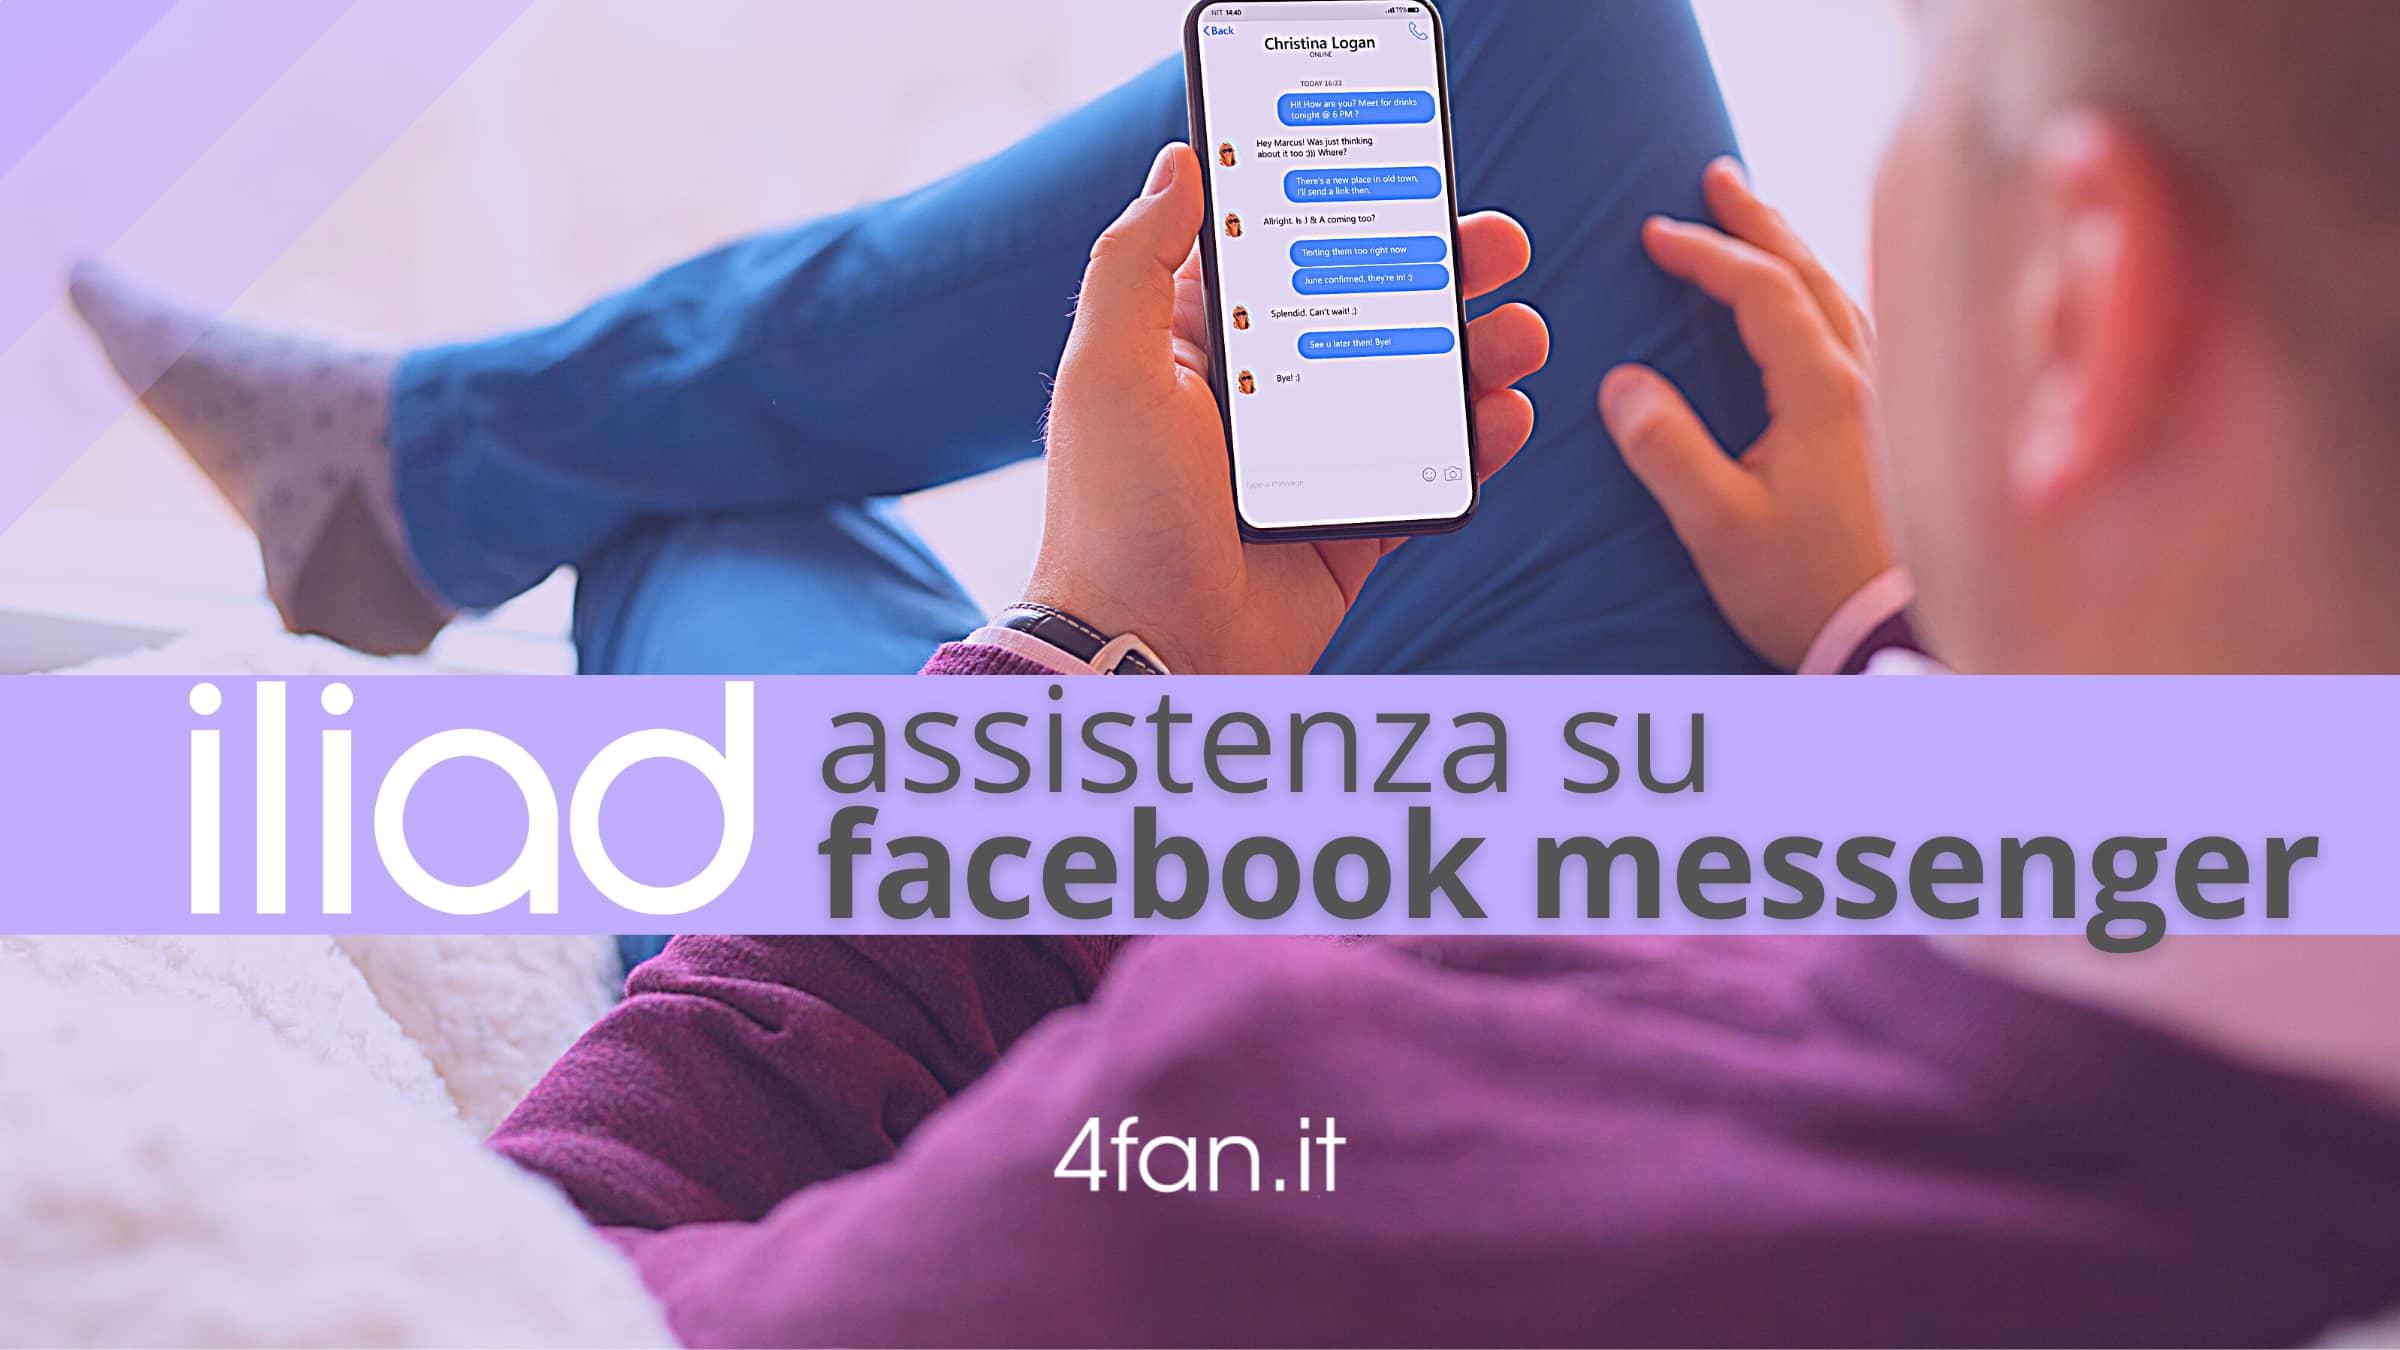 Iliad assistenza Facebook Messenger